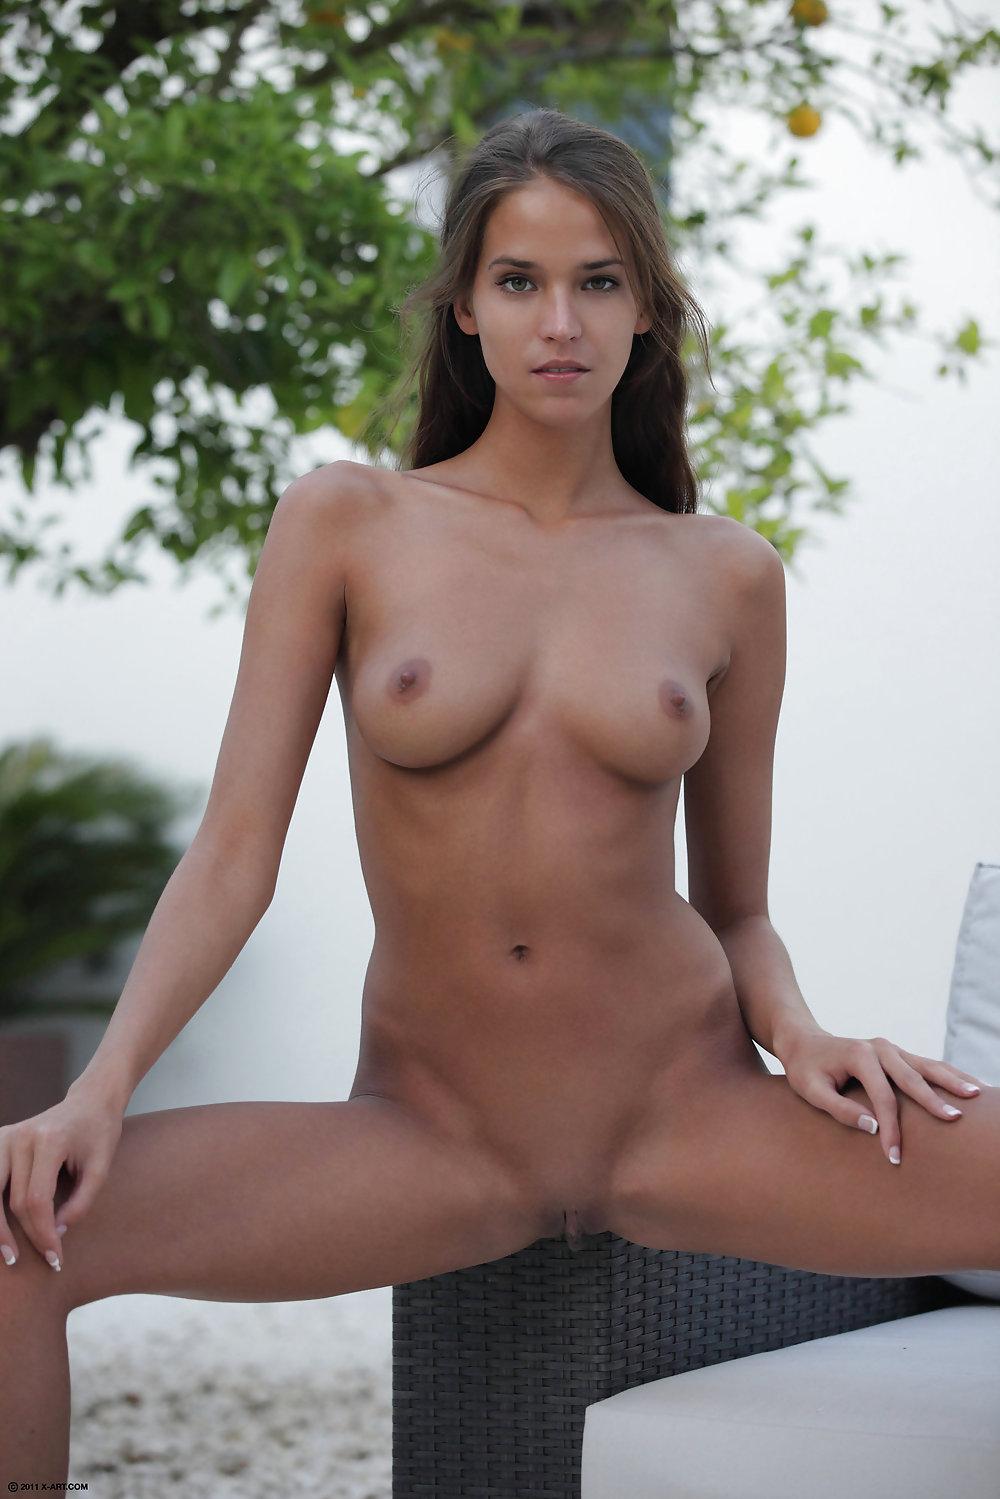 Big boobs video naked-3609